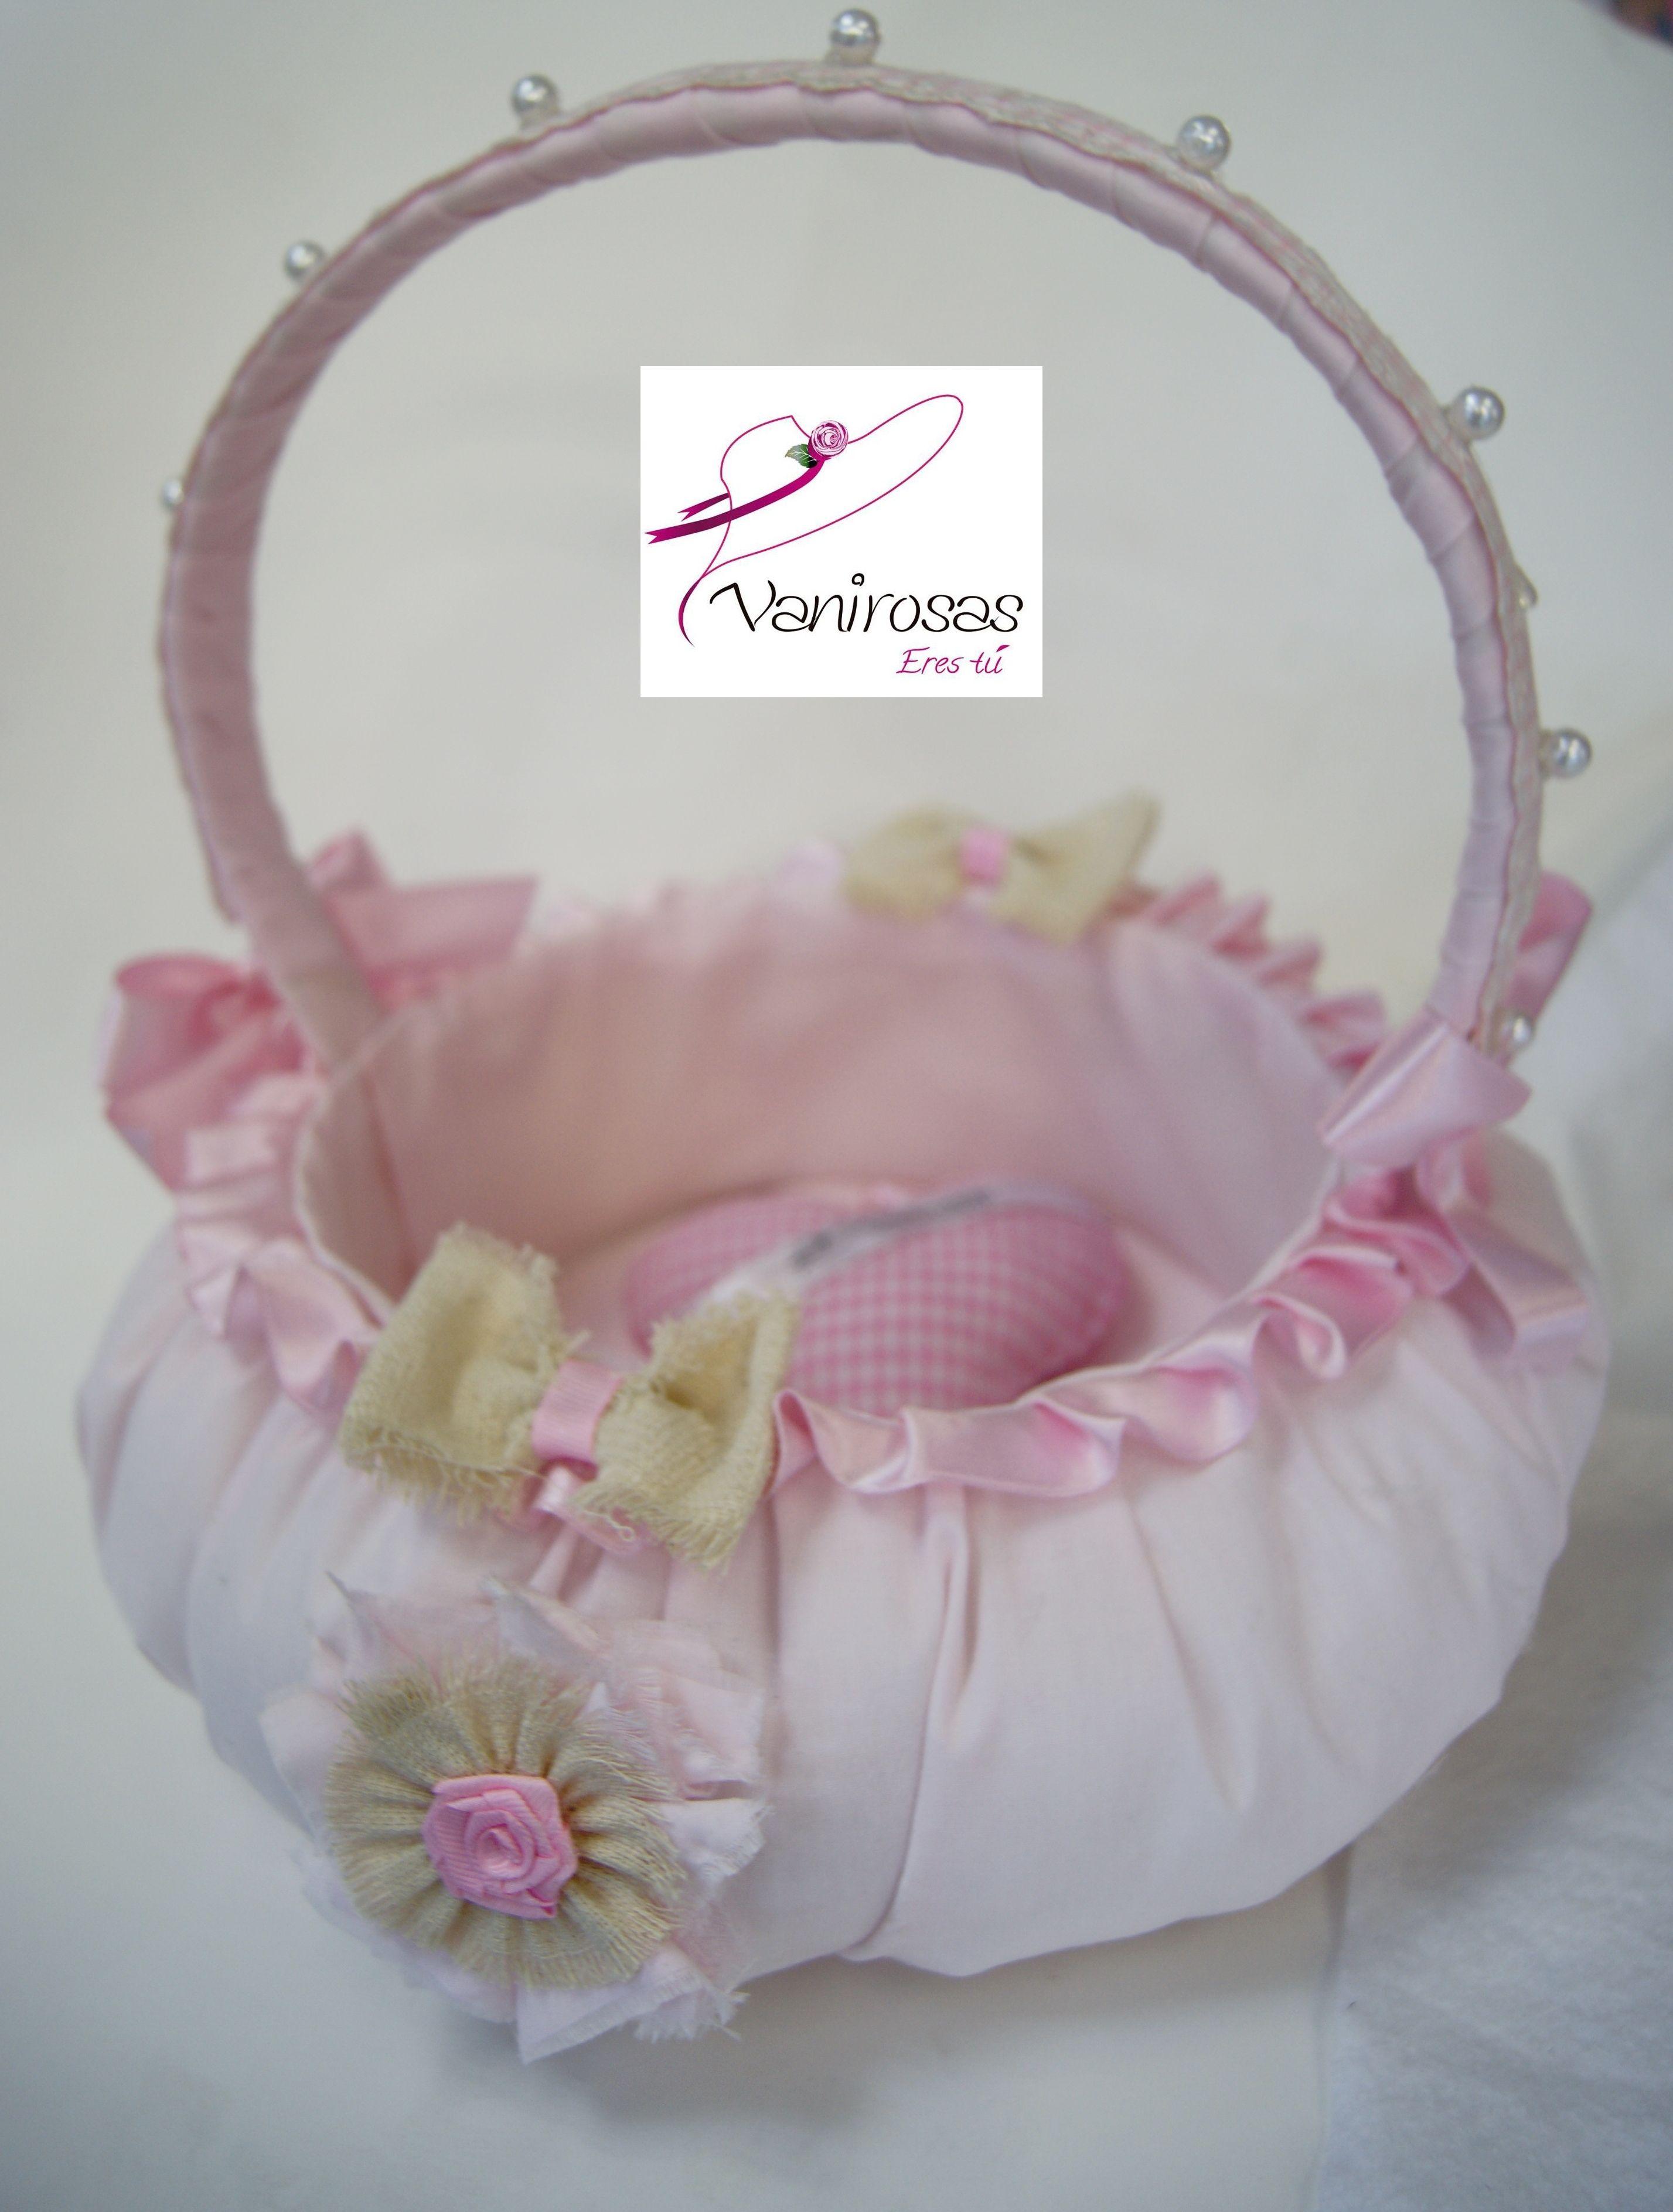 canasta de tela nanzu tono rosa palido o rosa bebe para los souvenir